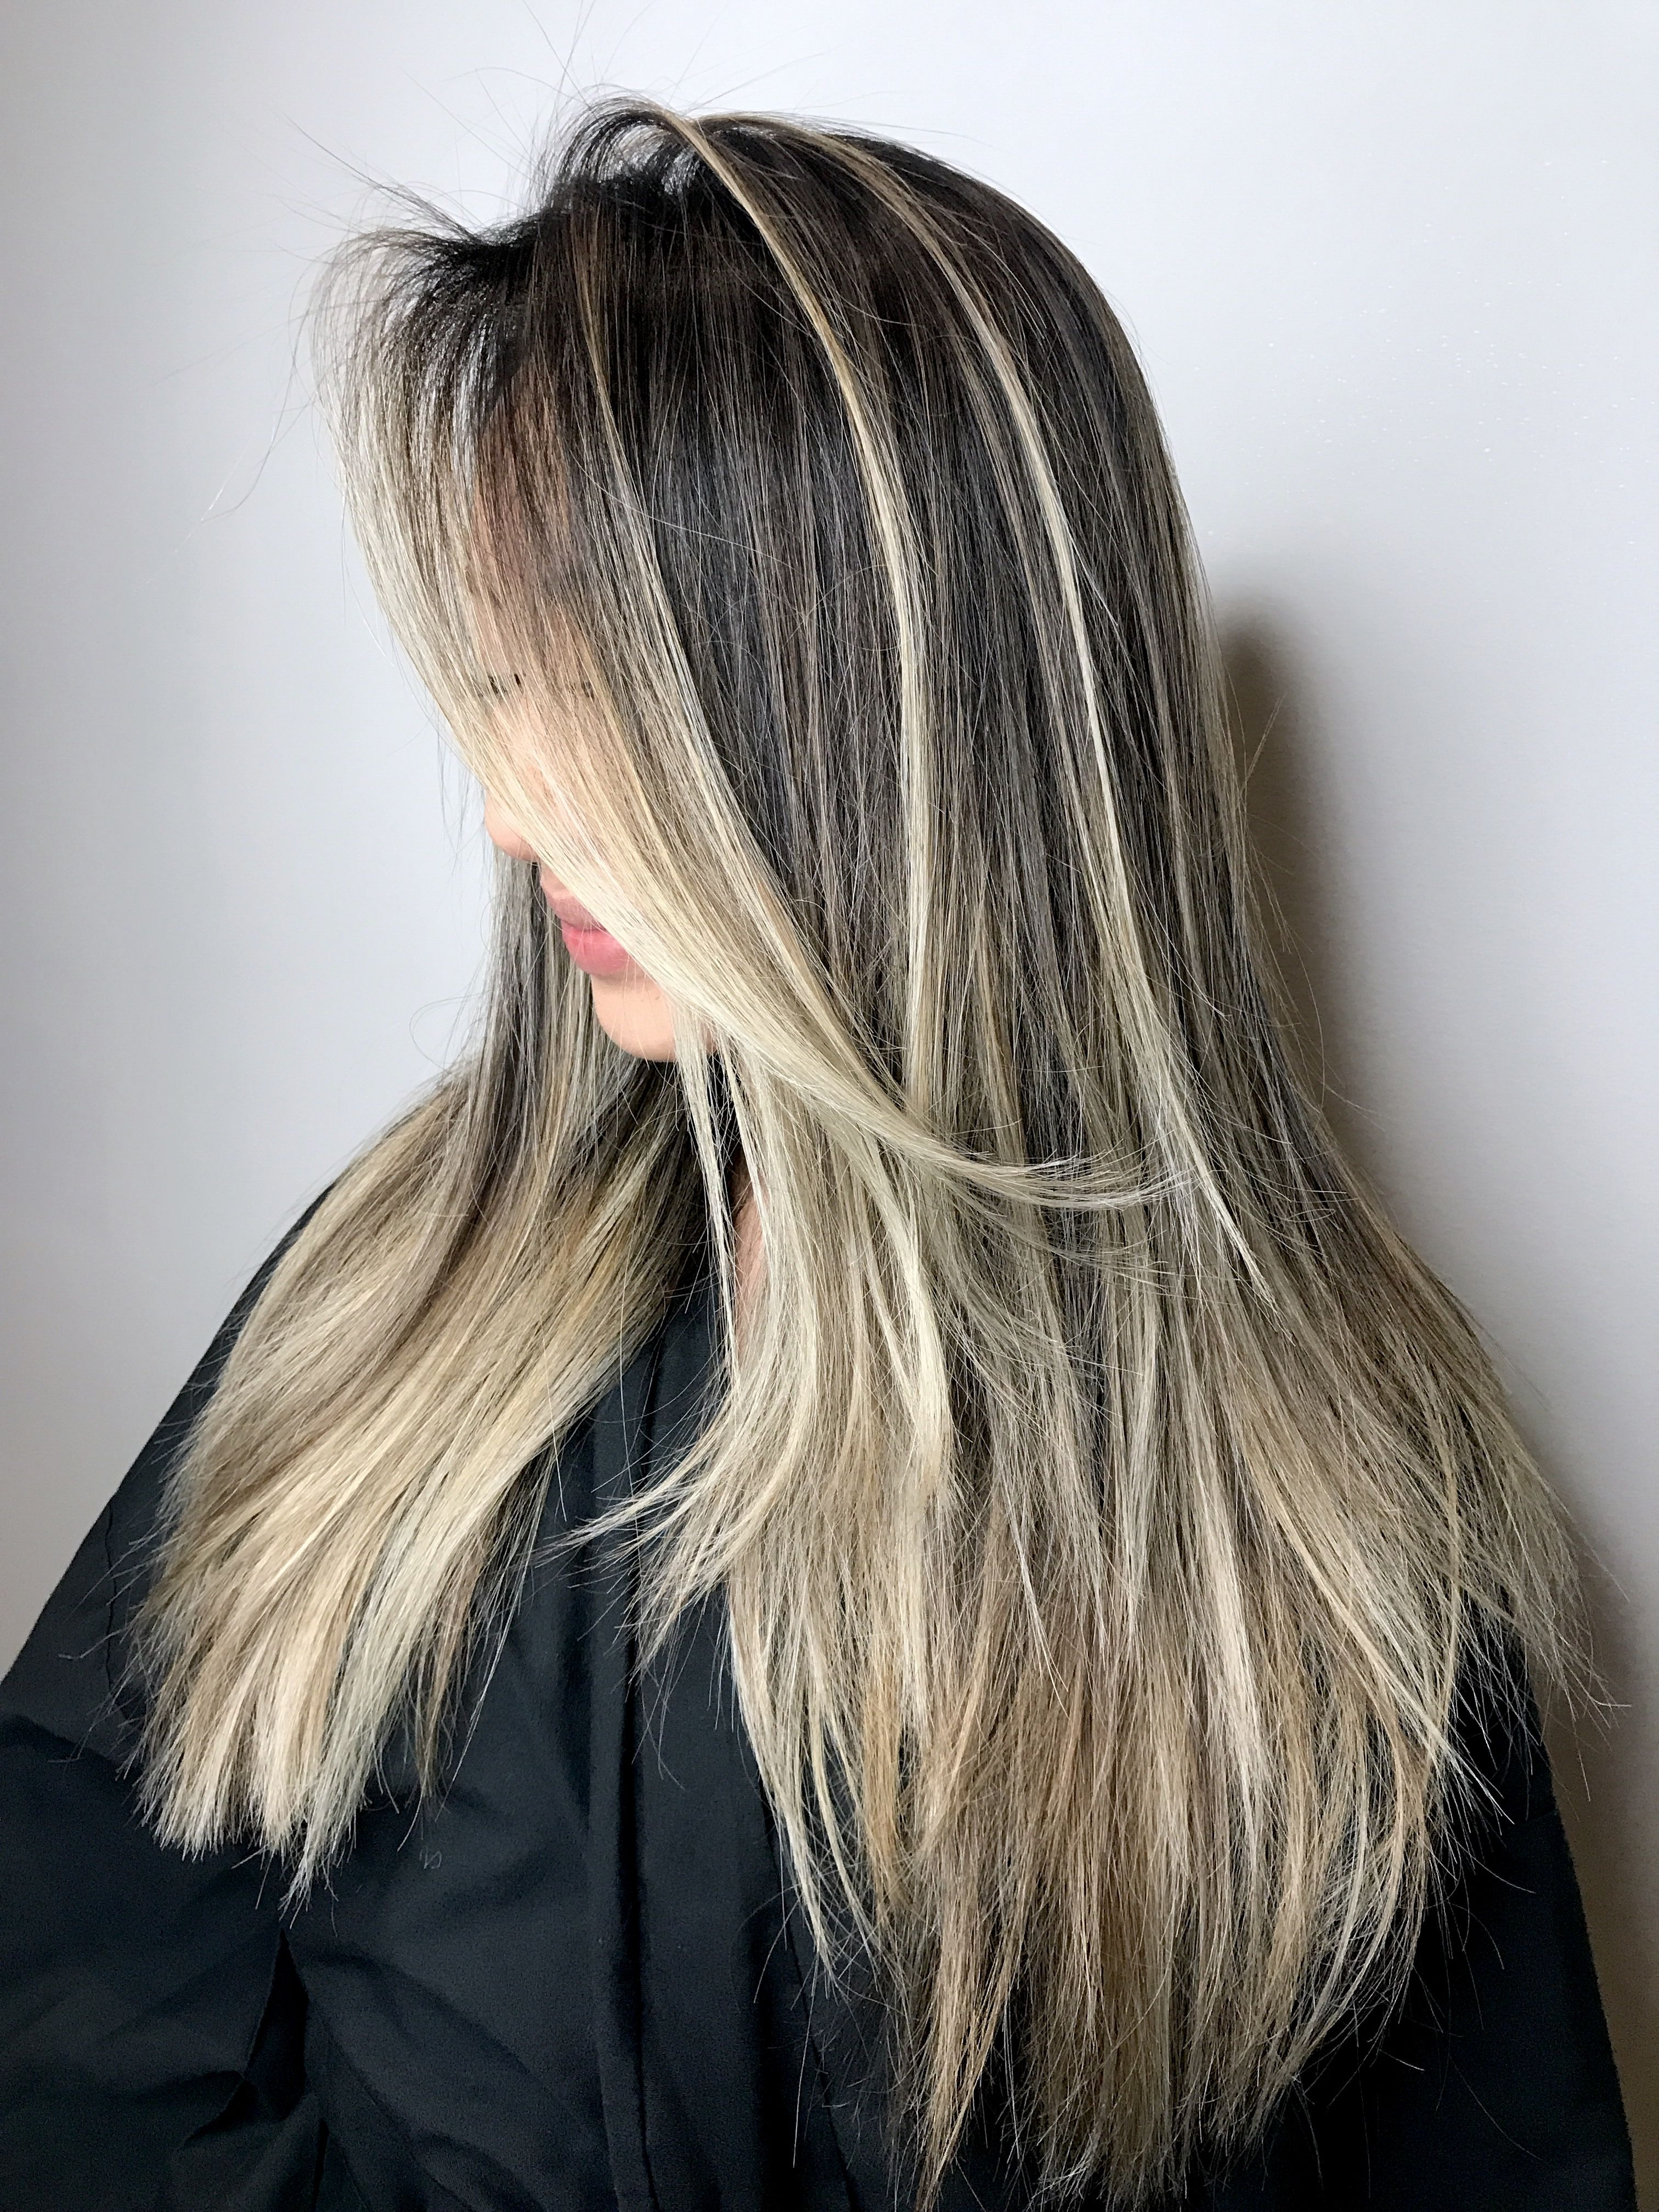 Asian blonde hair, balayage for dark hair, blonde, texture